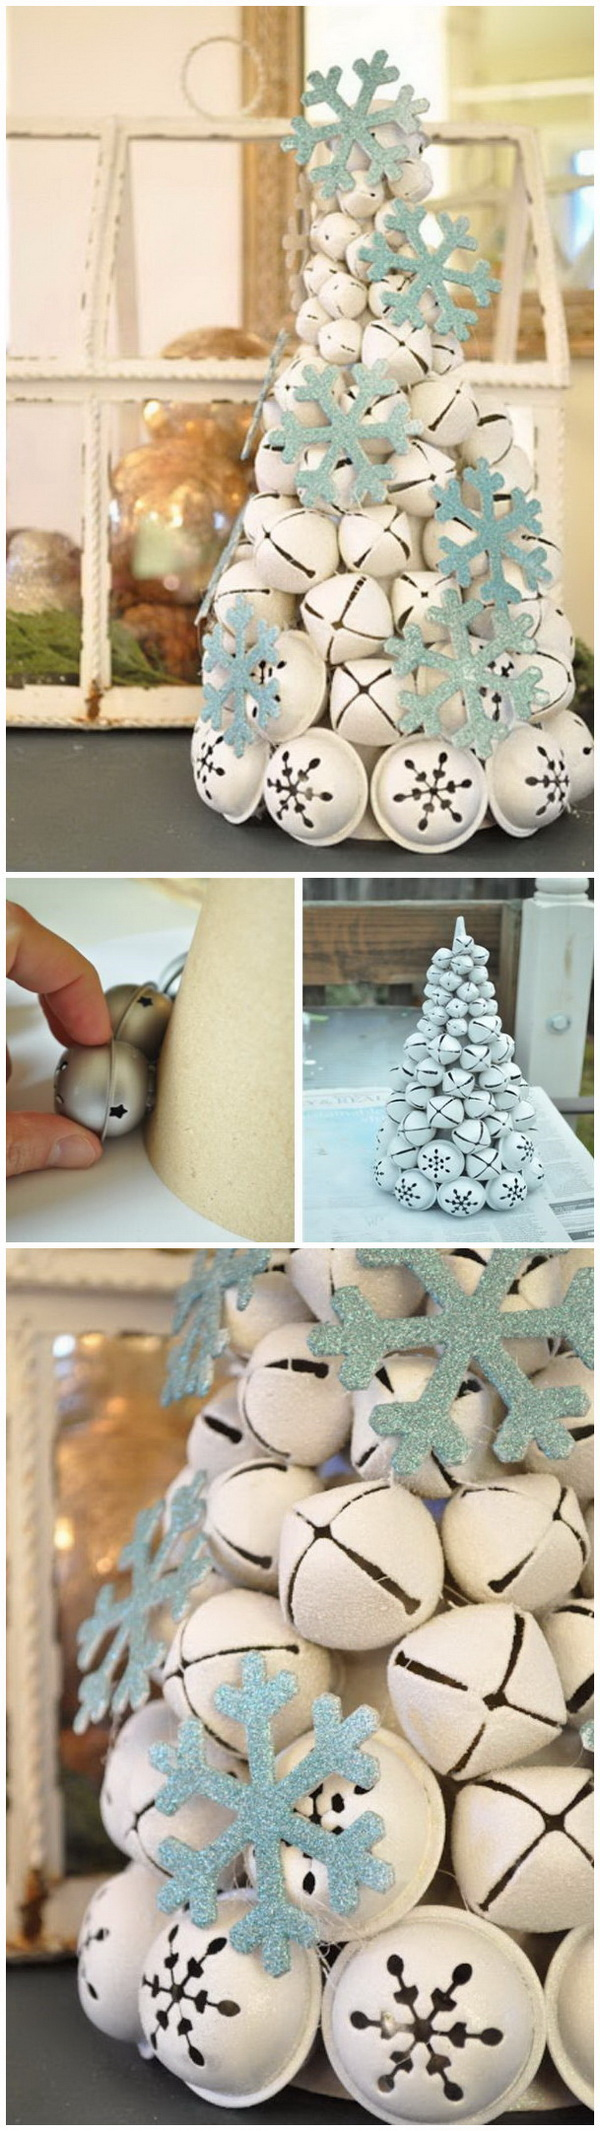 DIY Jingle Bell Tree.